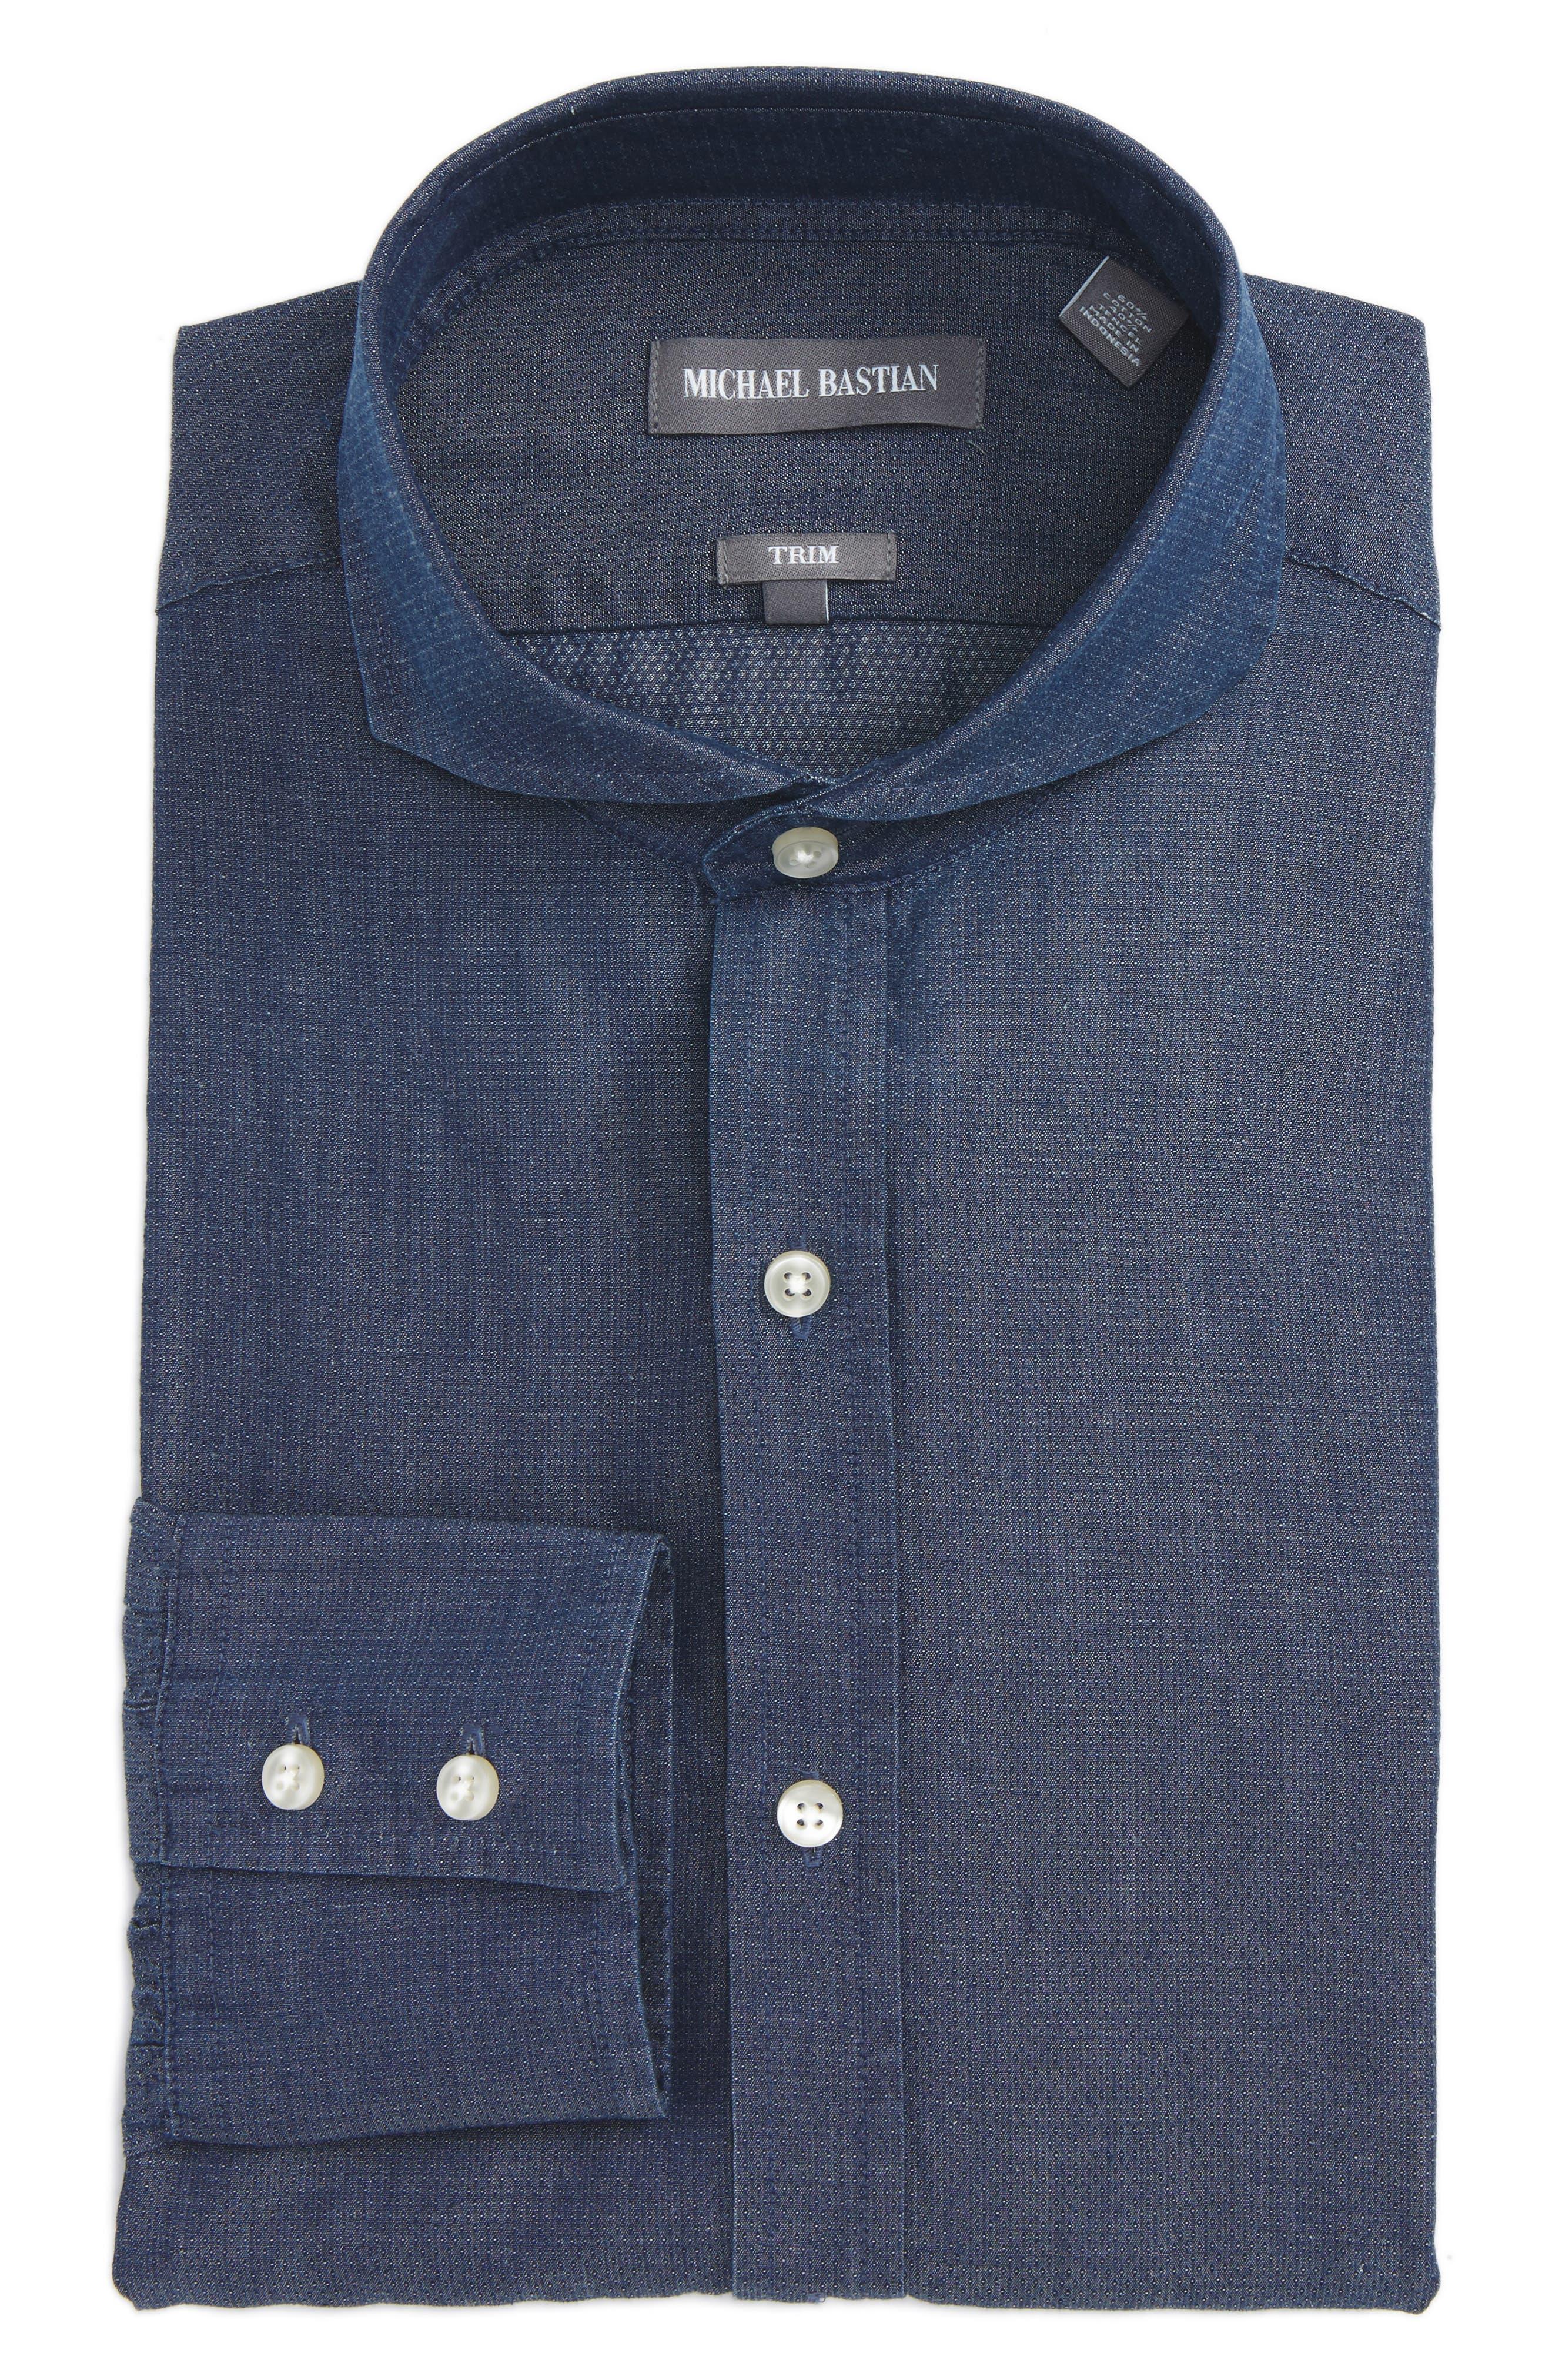 Michael Bastian Trim Fit Micro Foulard Dress Shirt